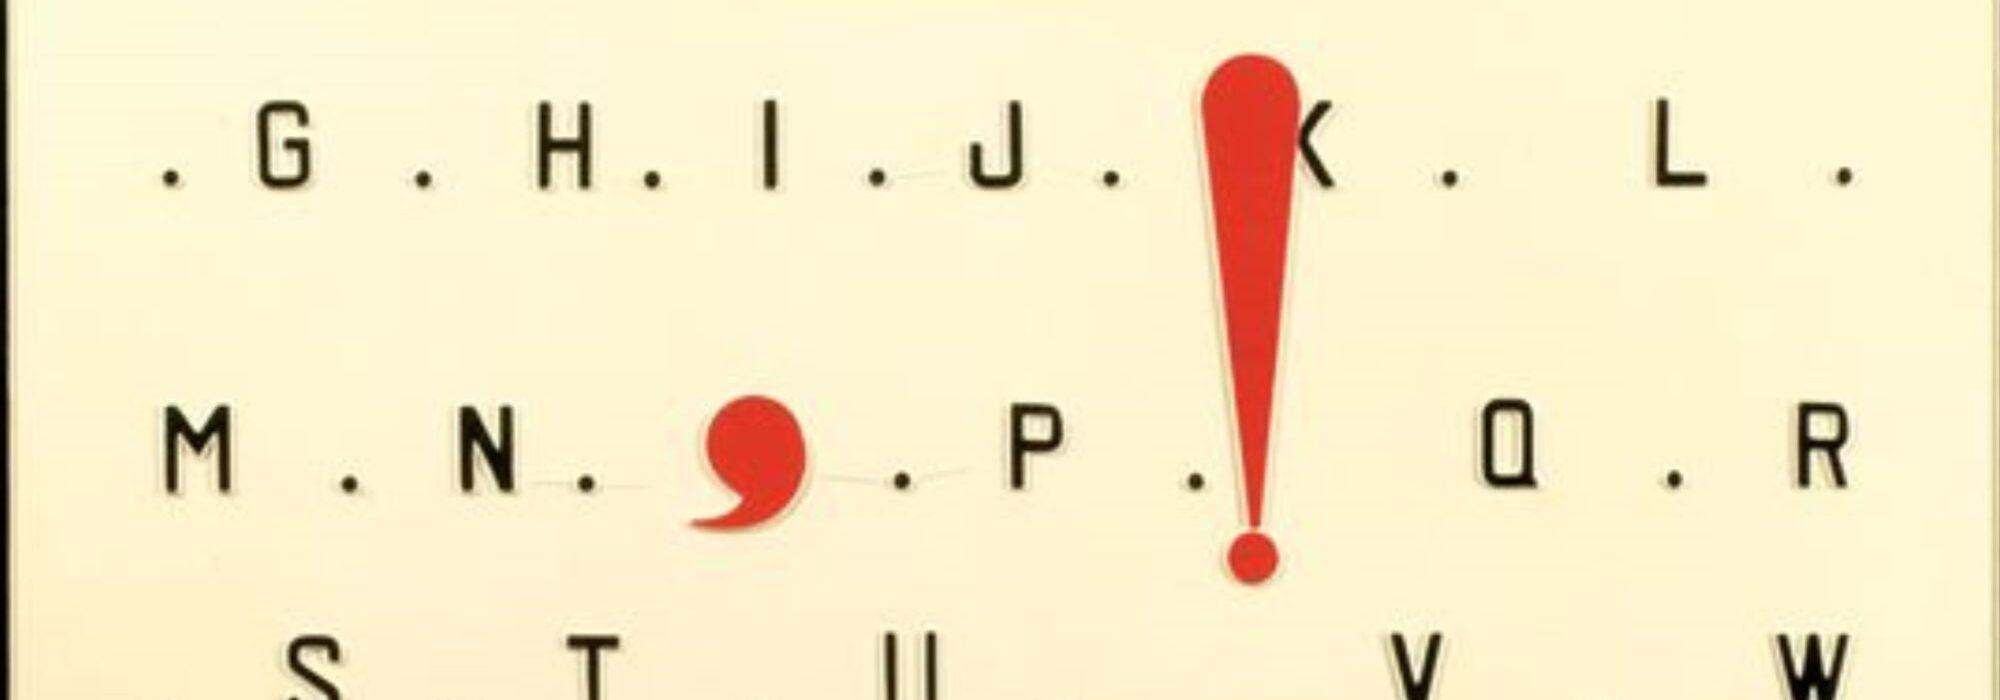 Imagem: Comma & exclamation mark (Marcel Broodthaers, 1970)